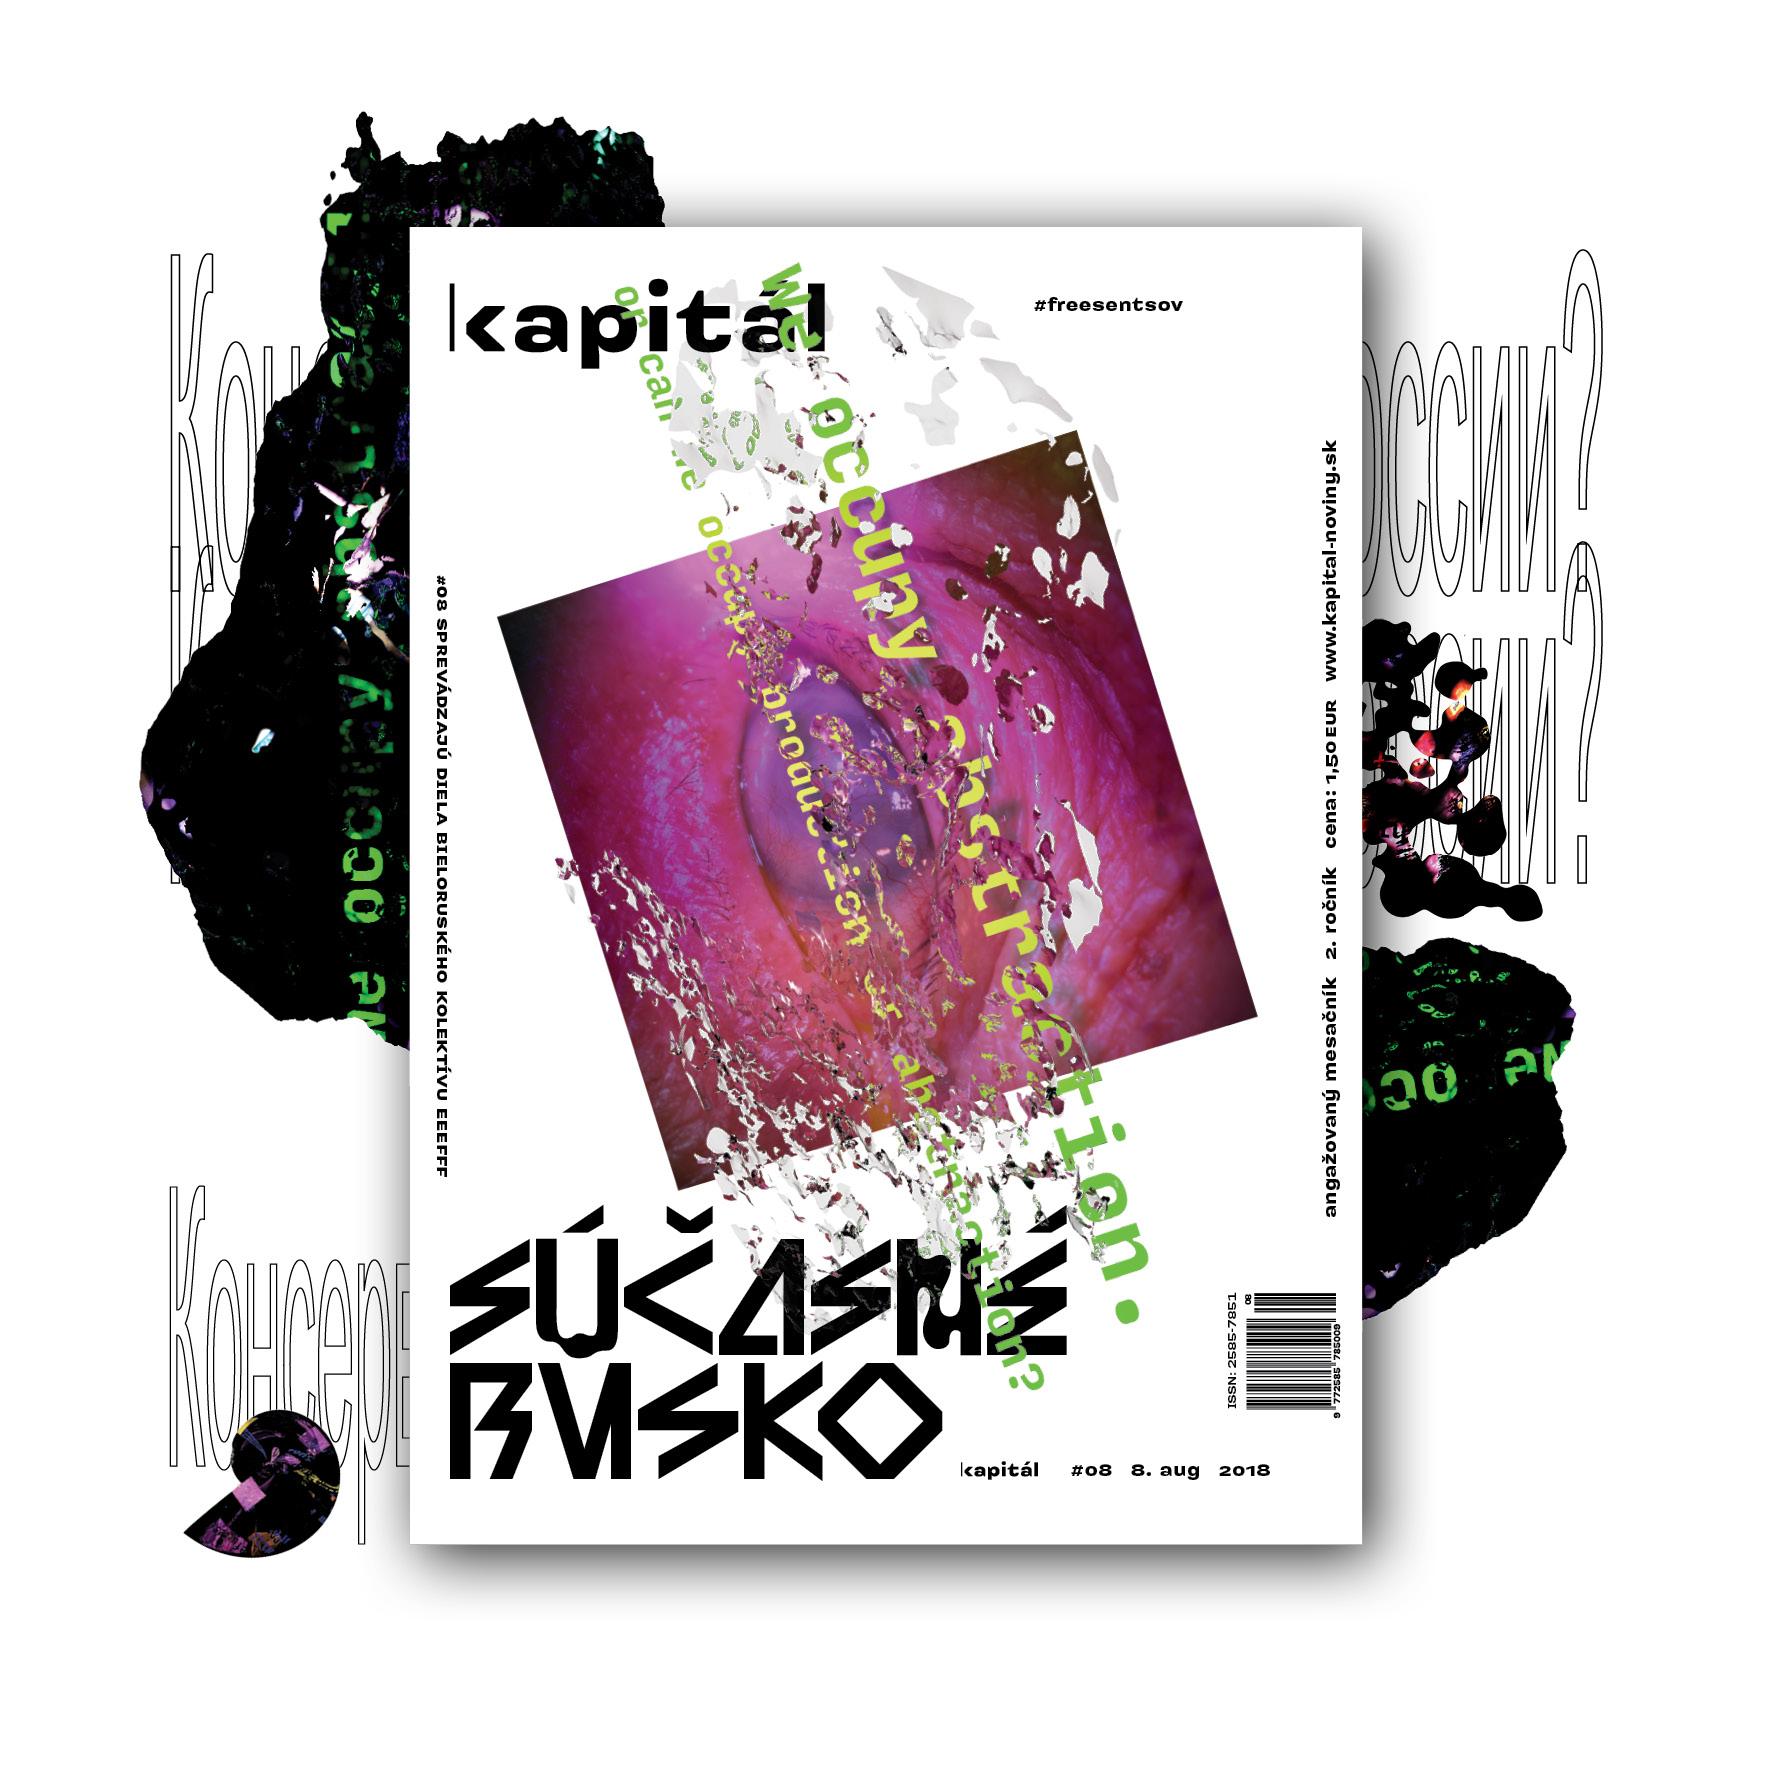 https://i2.wp.com/kapital-noviny.sk/wp-content/uploads/2018/09/1806_INSTA_KAPITAL-062.jpg?fit=1772%2C1772&ssl=1